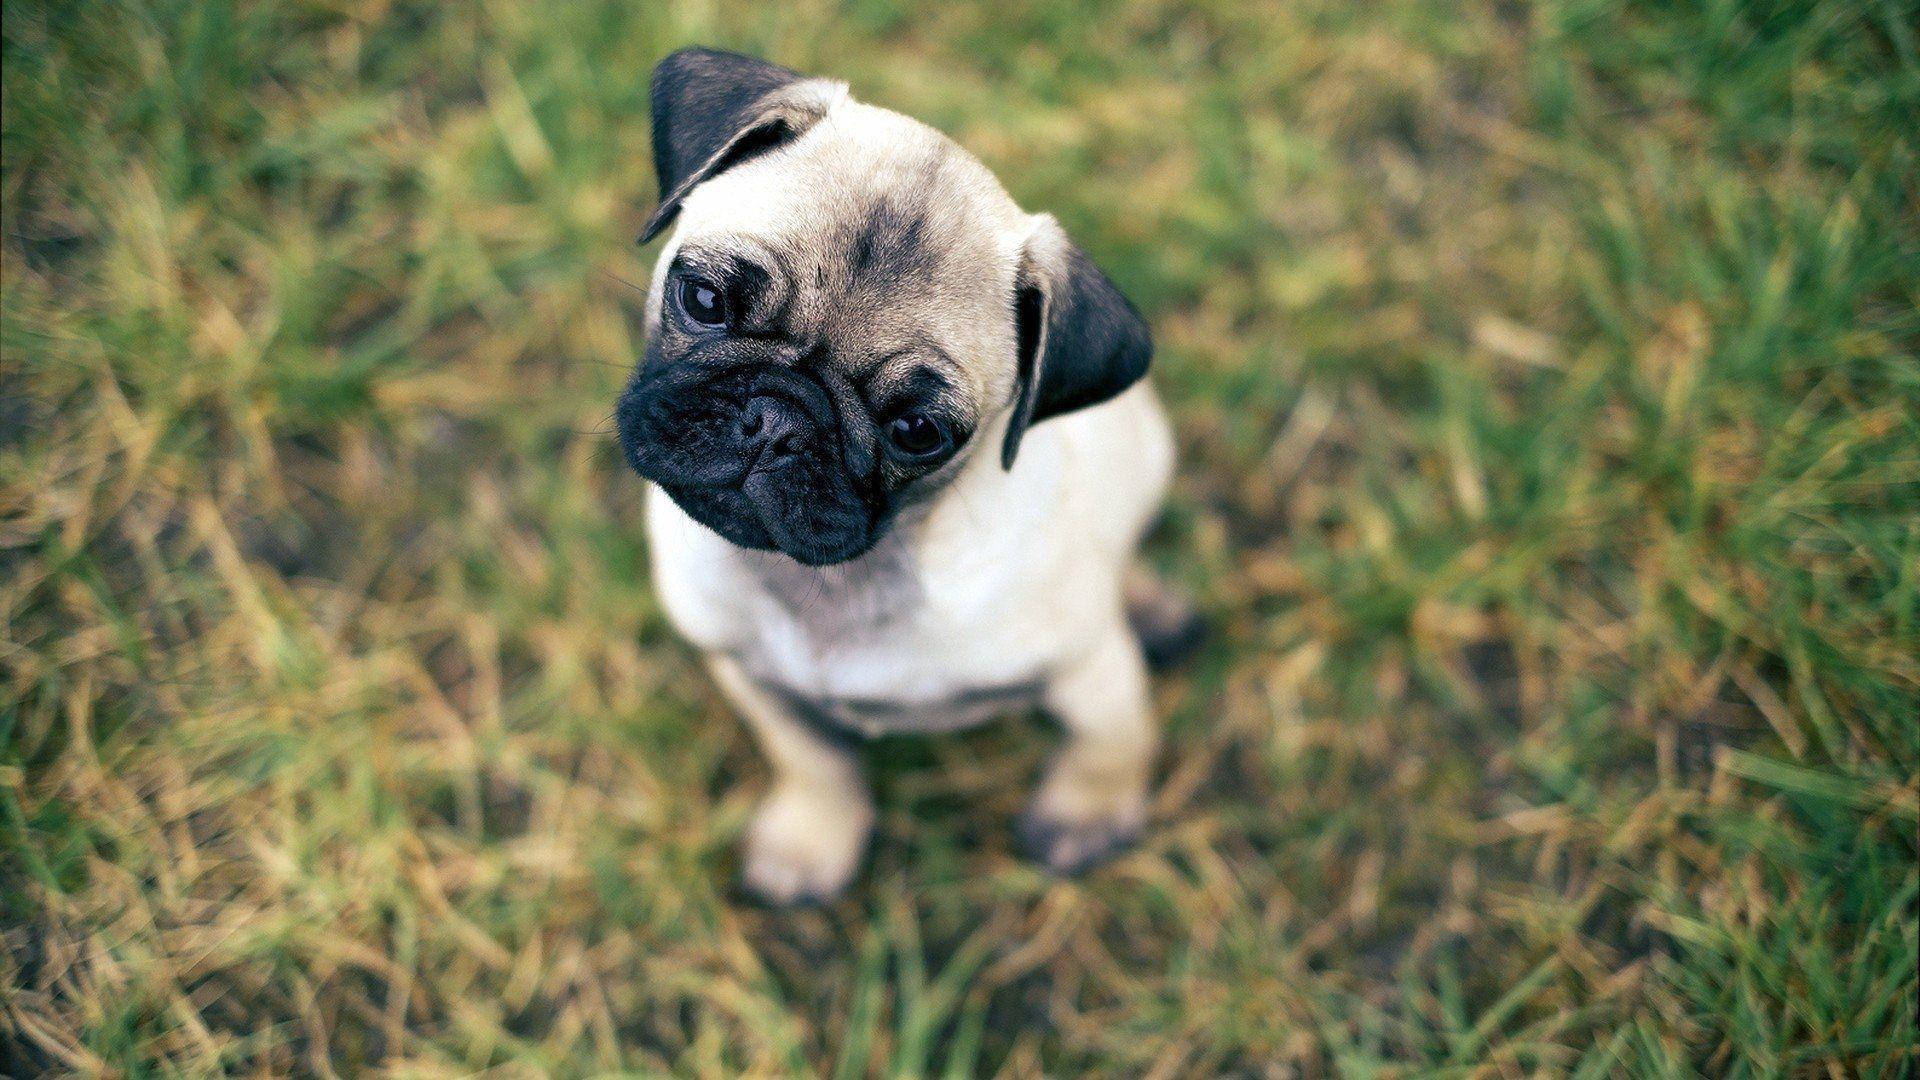 Pug Puppy Wallpapers Hd Wallpaper Cave